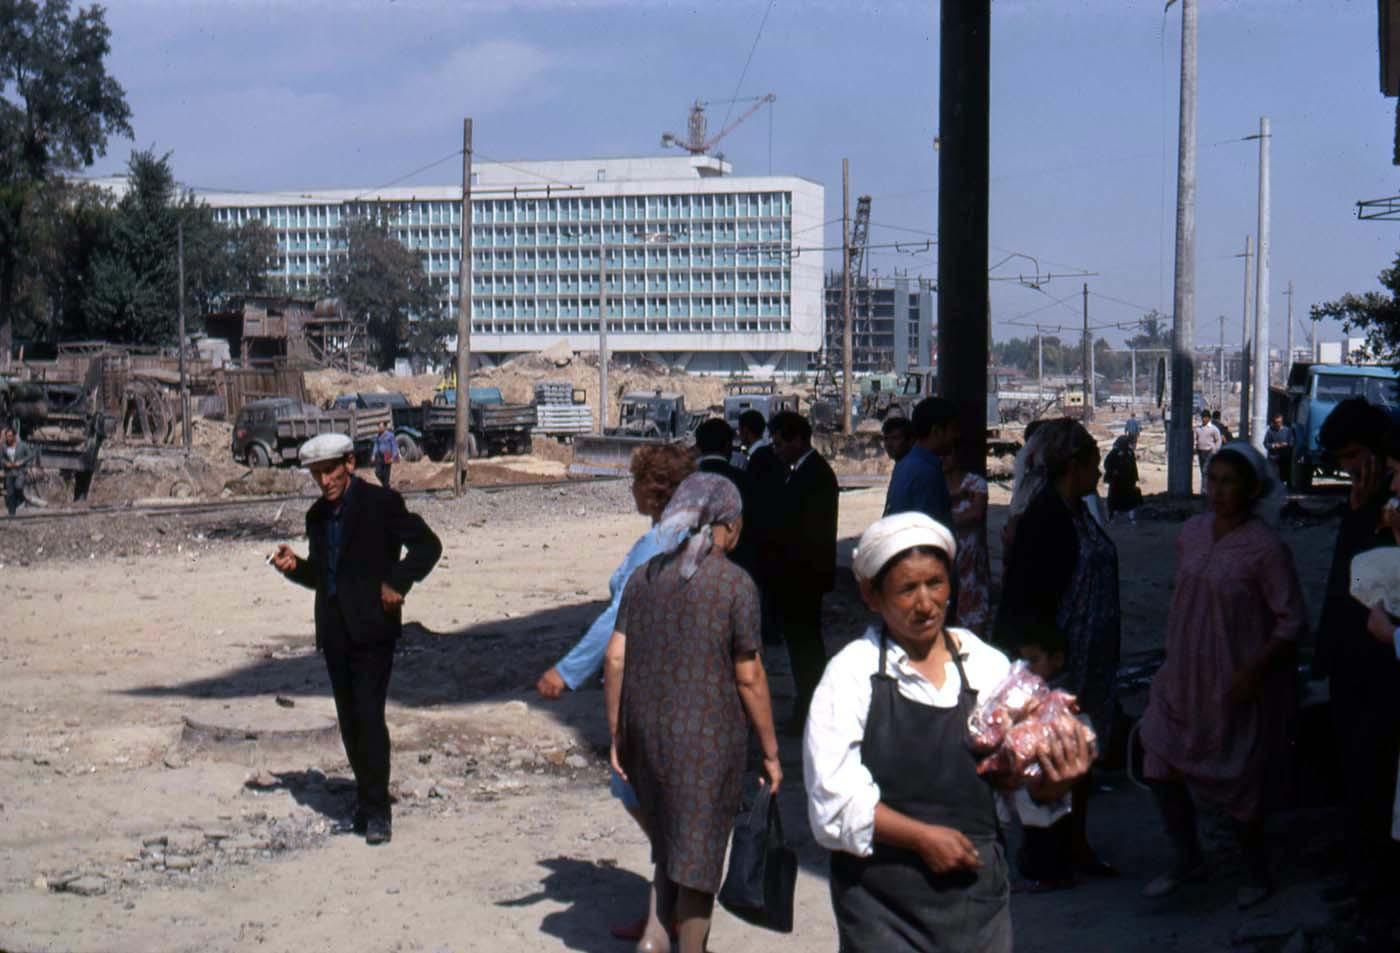 1969 Tashkent by Snider Irving